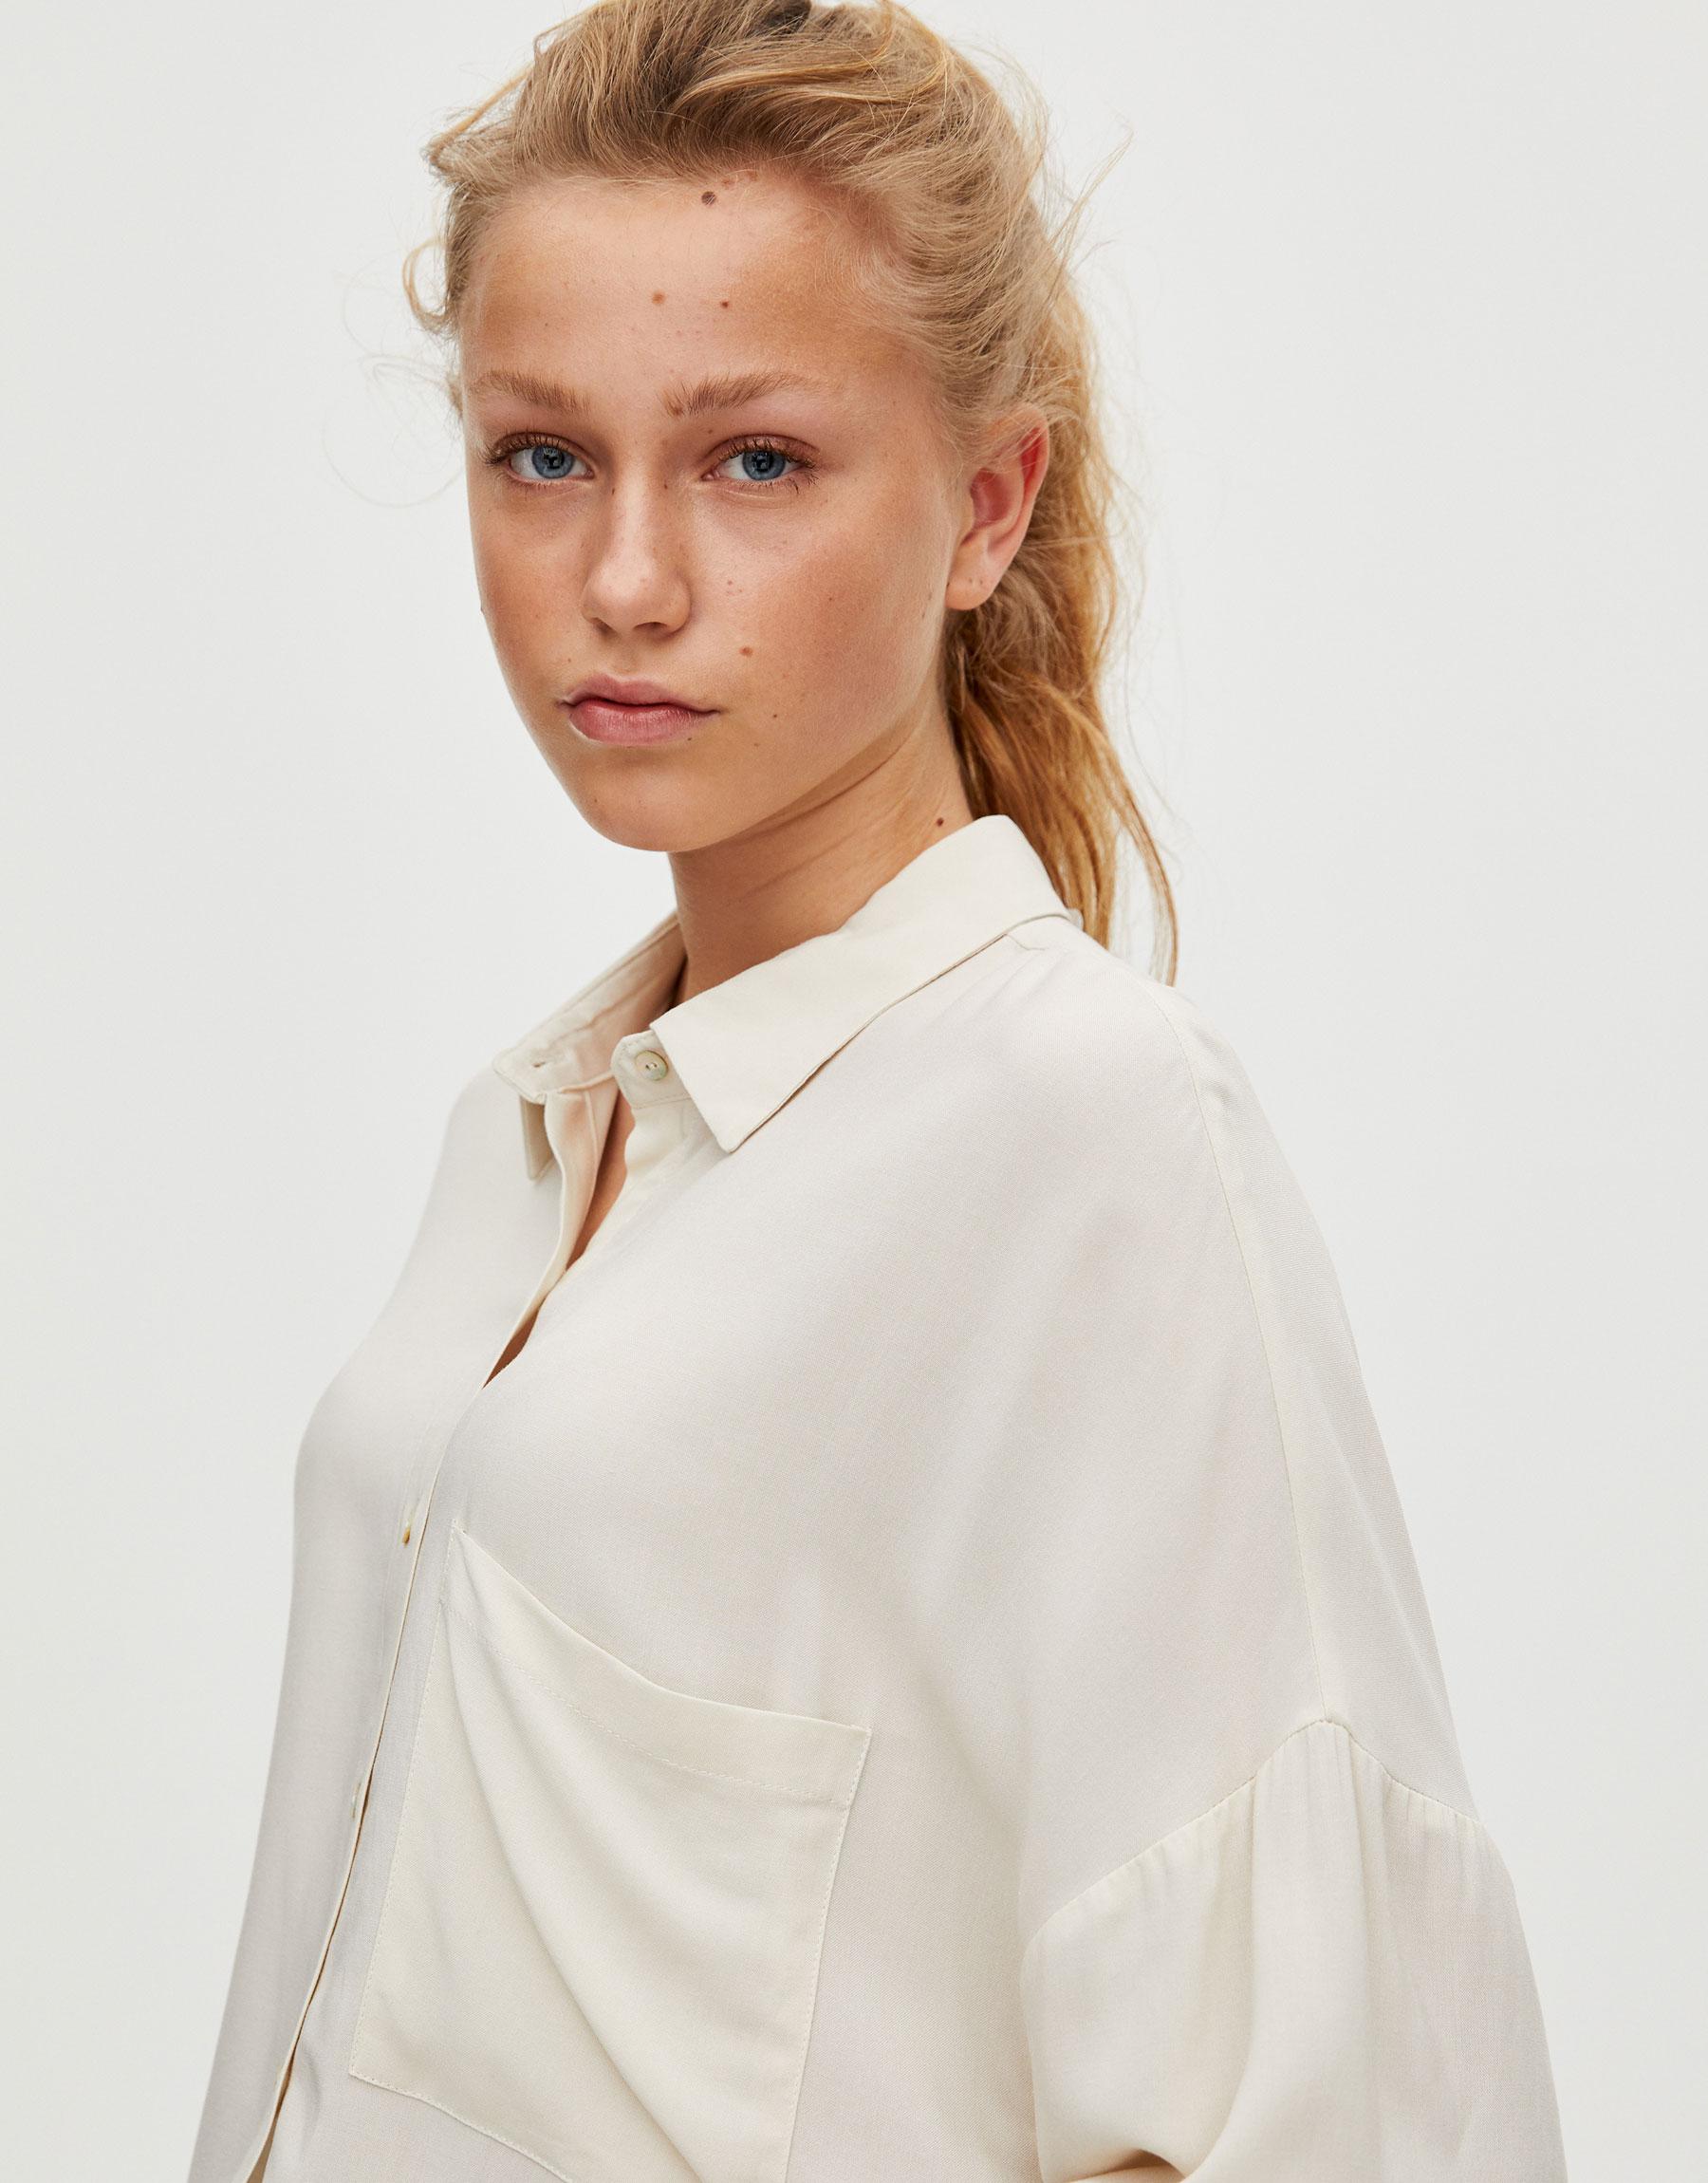 aa2d2b87 Oversized short sleeve shirt. Pullbear Pullbear. 19.90 $